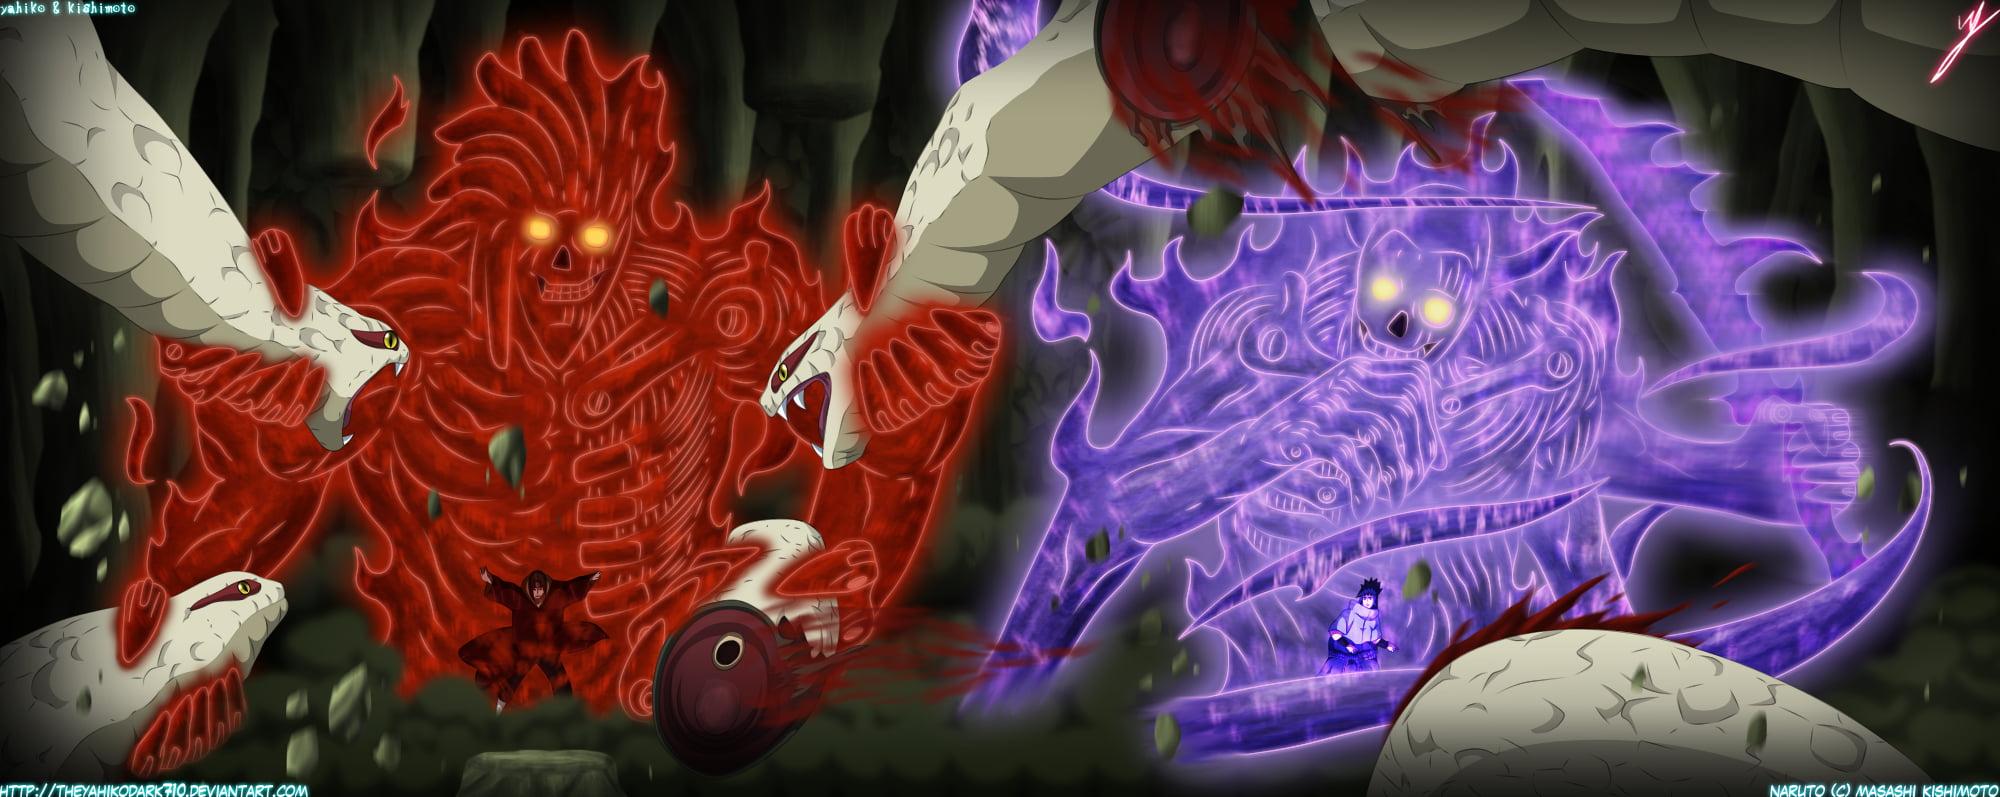 susanoo illustrations anime naruto